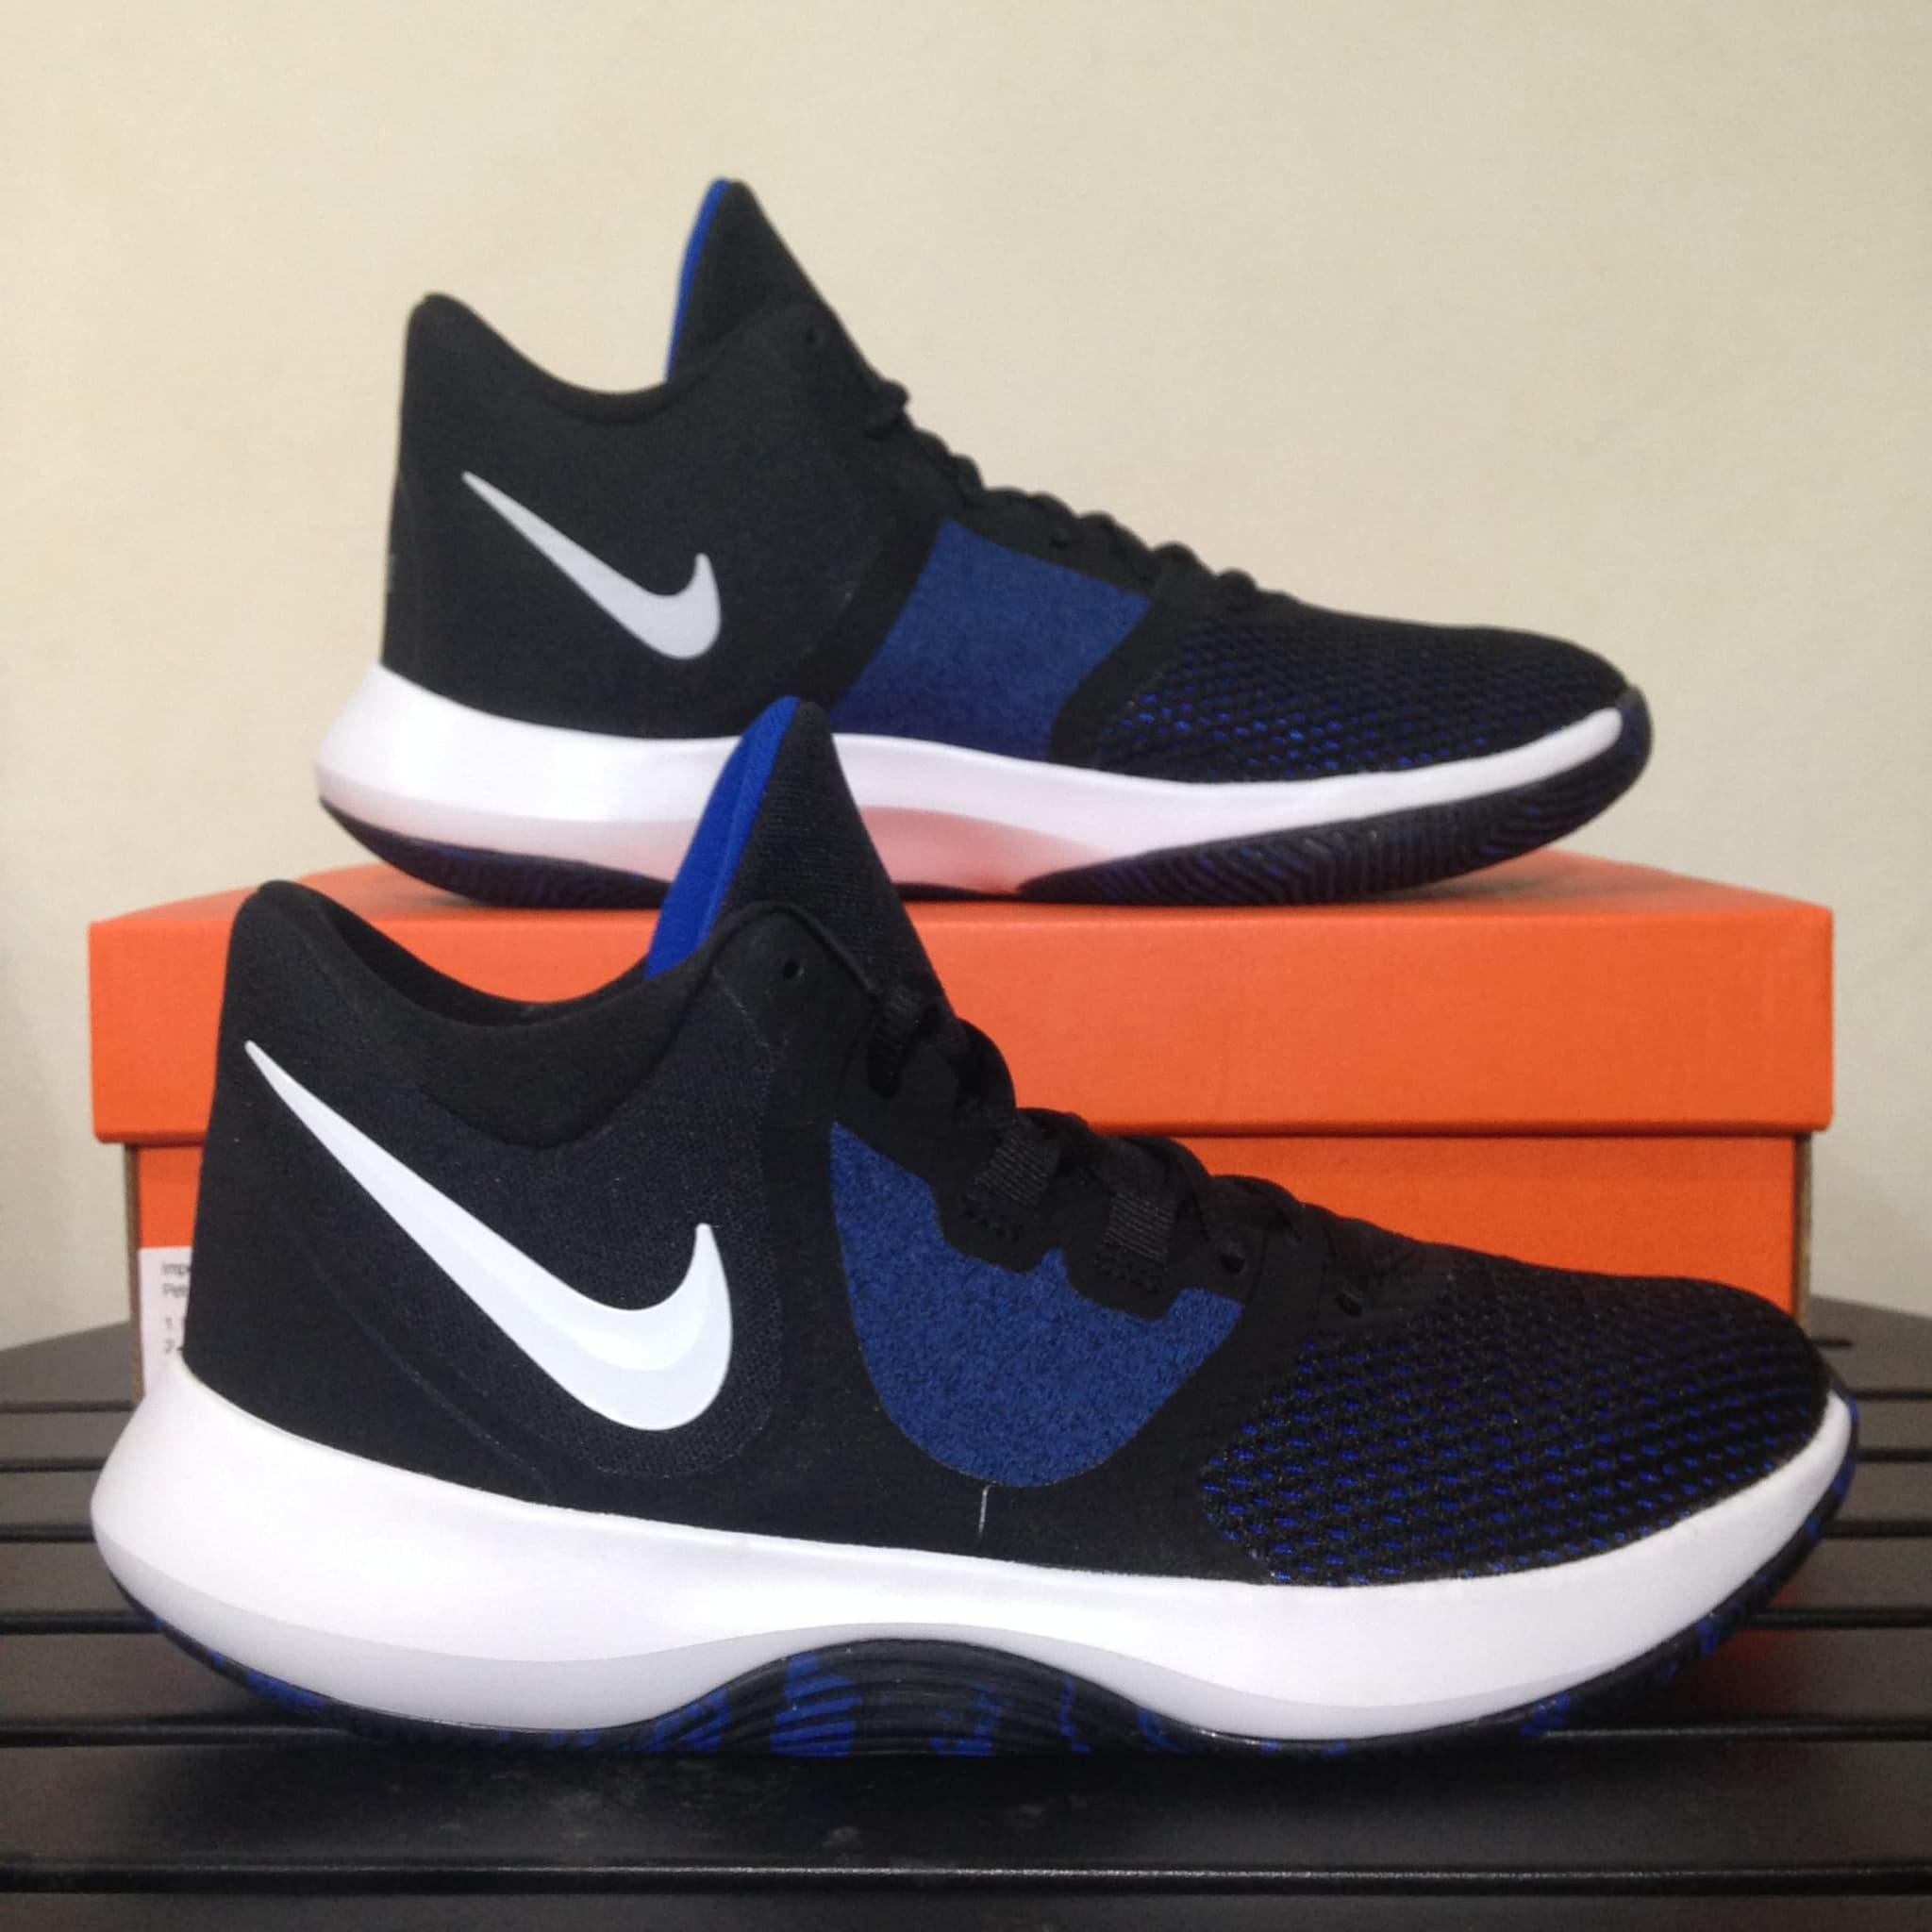 004 Black Ii Precision Royal Game Aa7069 Basket Ori Nike Sepatu Air sQrChtd